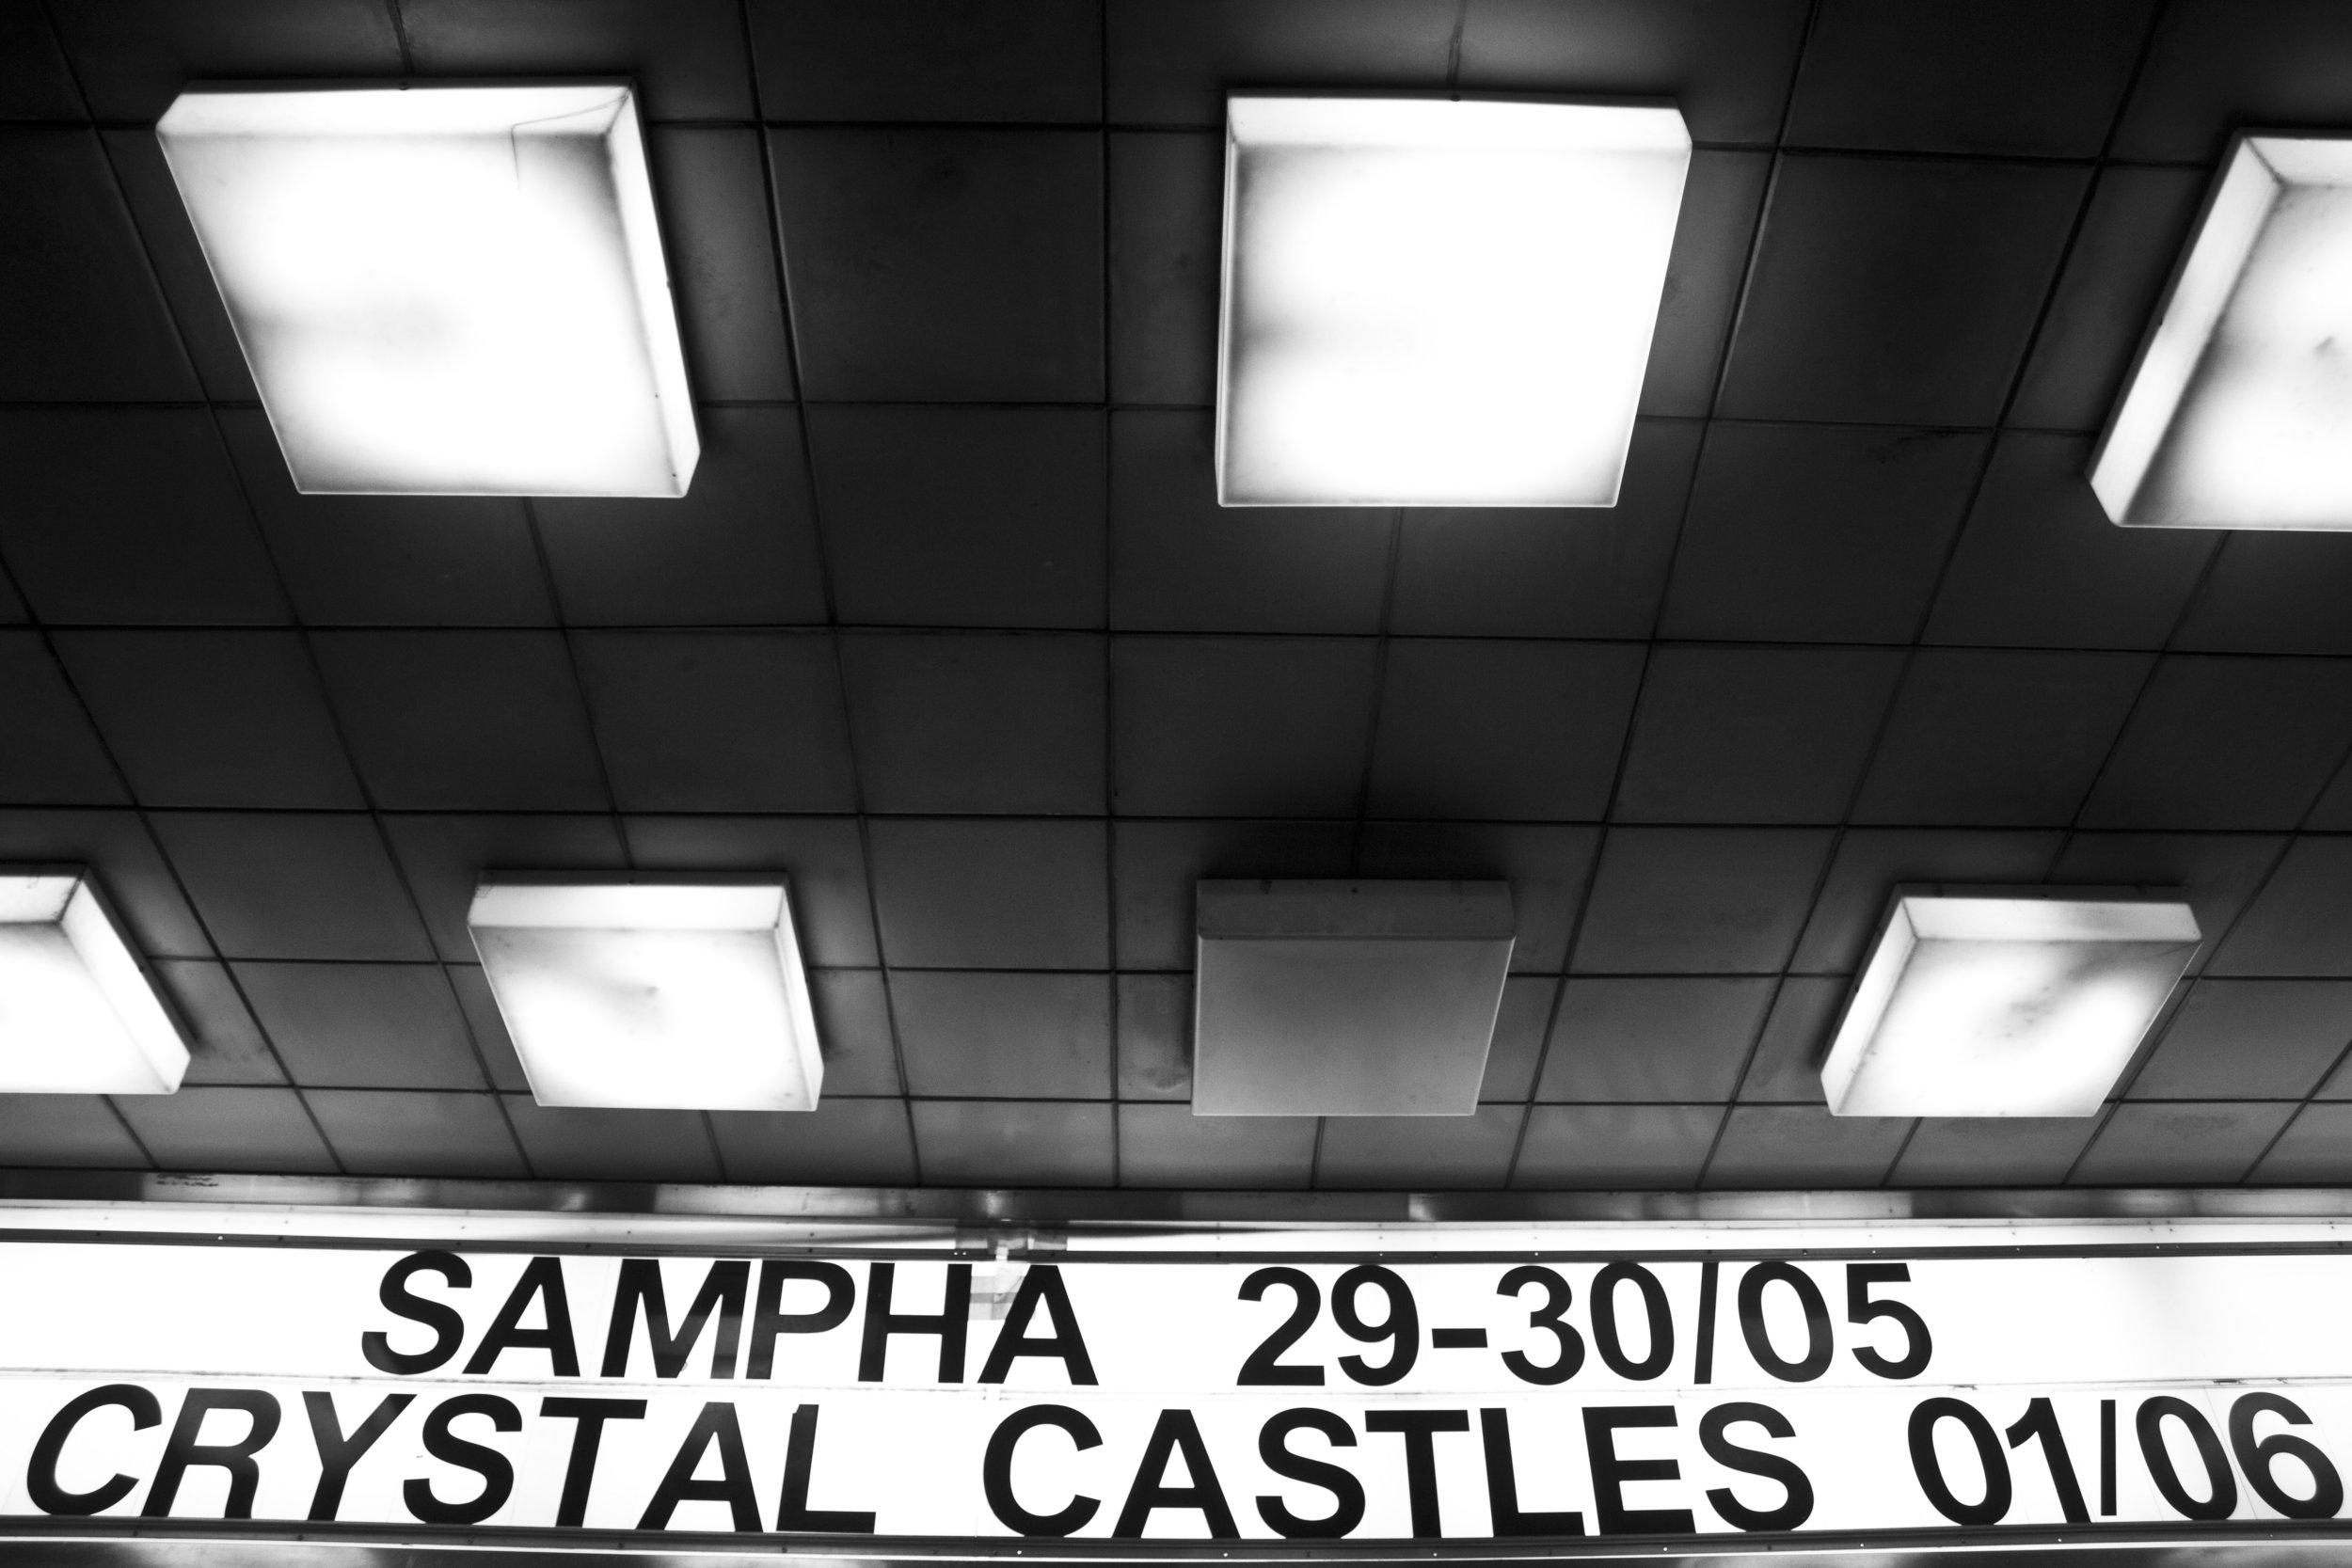 170601 Crystal Castles 1_JPEG 1.JPG